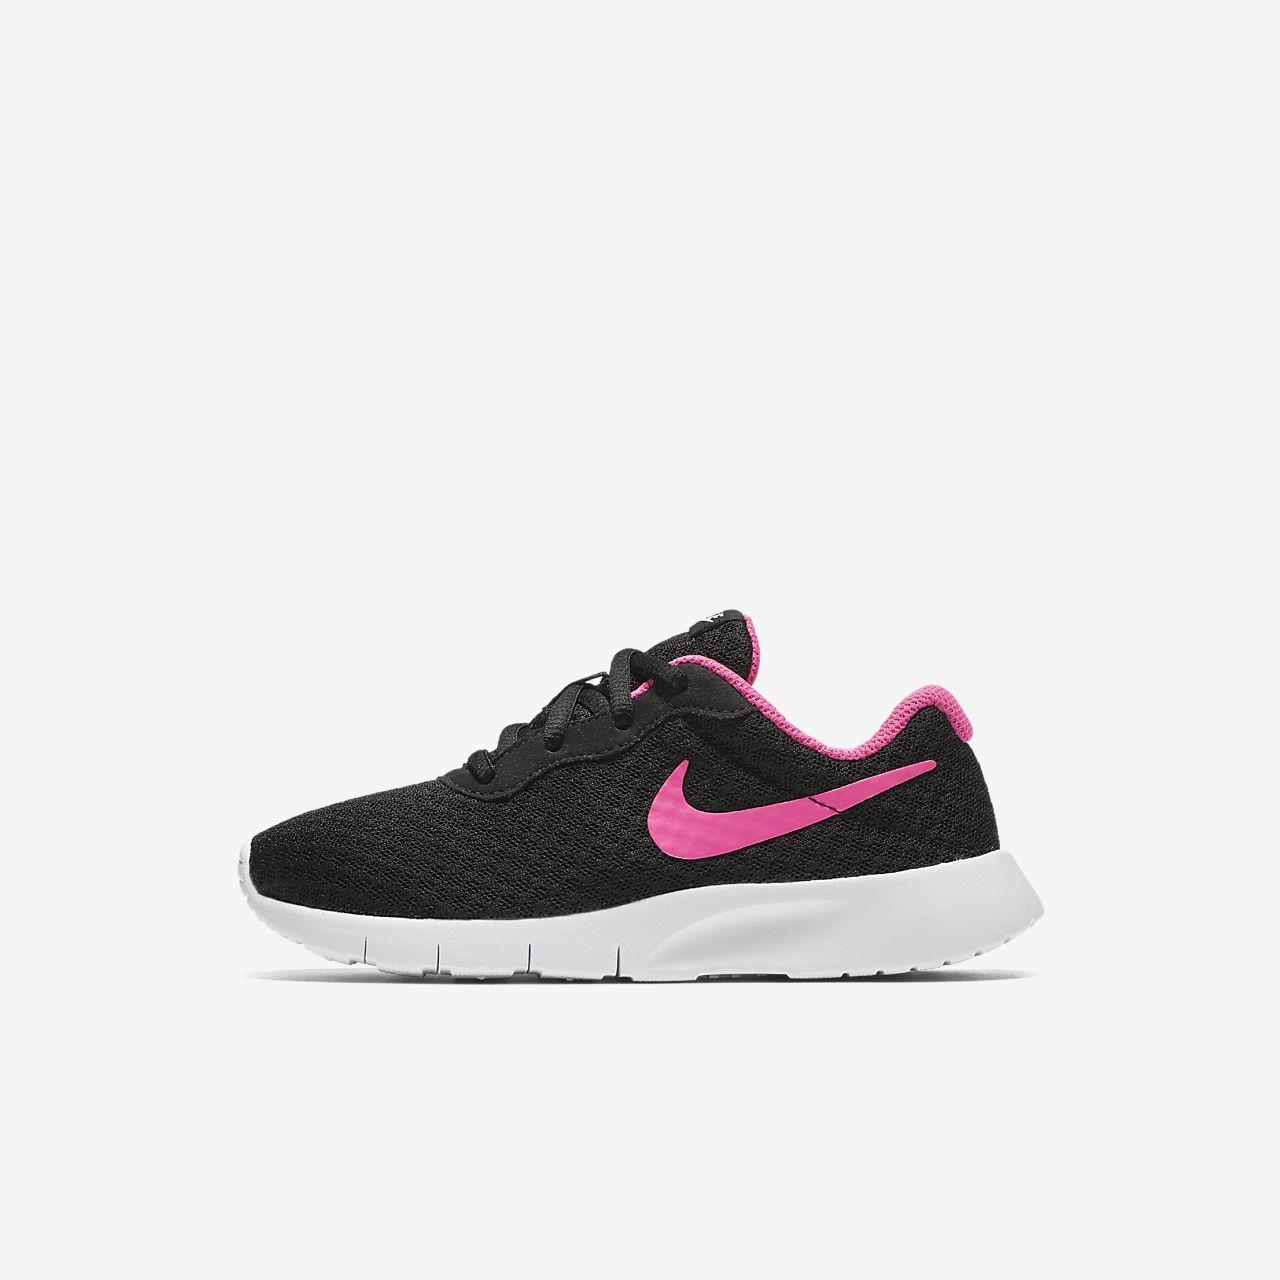 size 40 a4f9f 192a2 ... Chaussure Nike Tanjun pour Jeune enfant